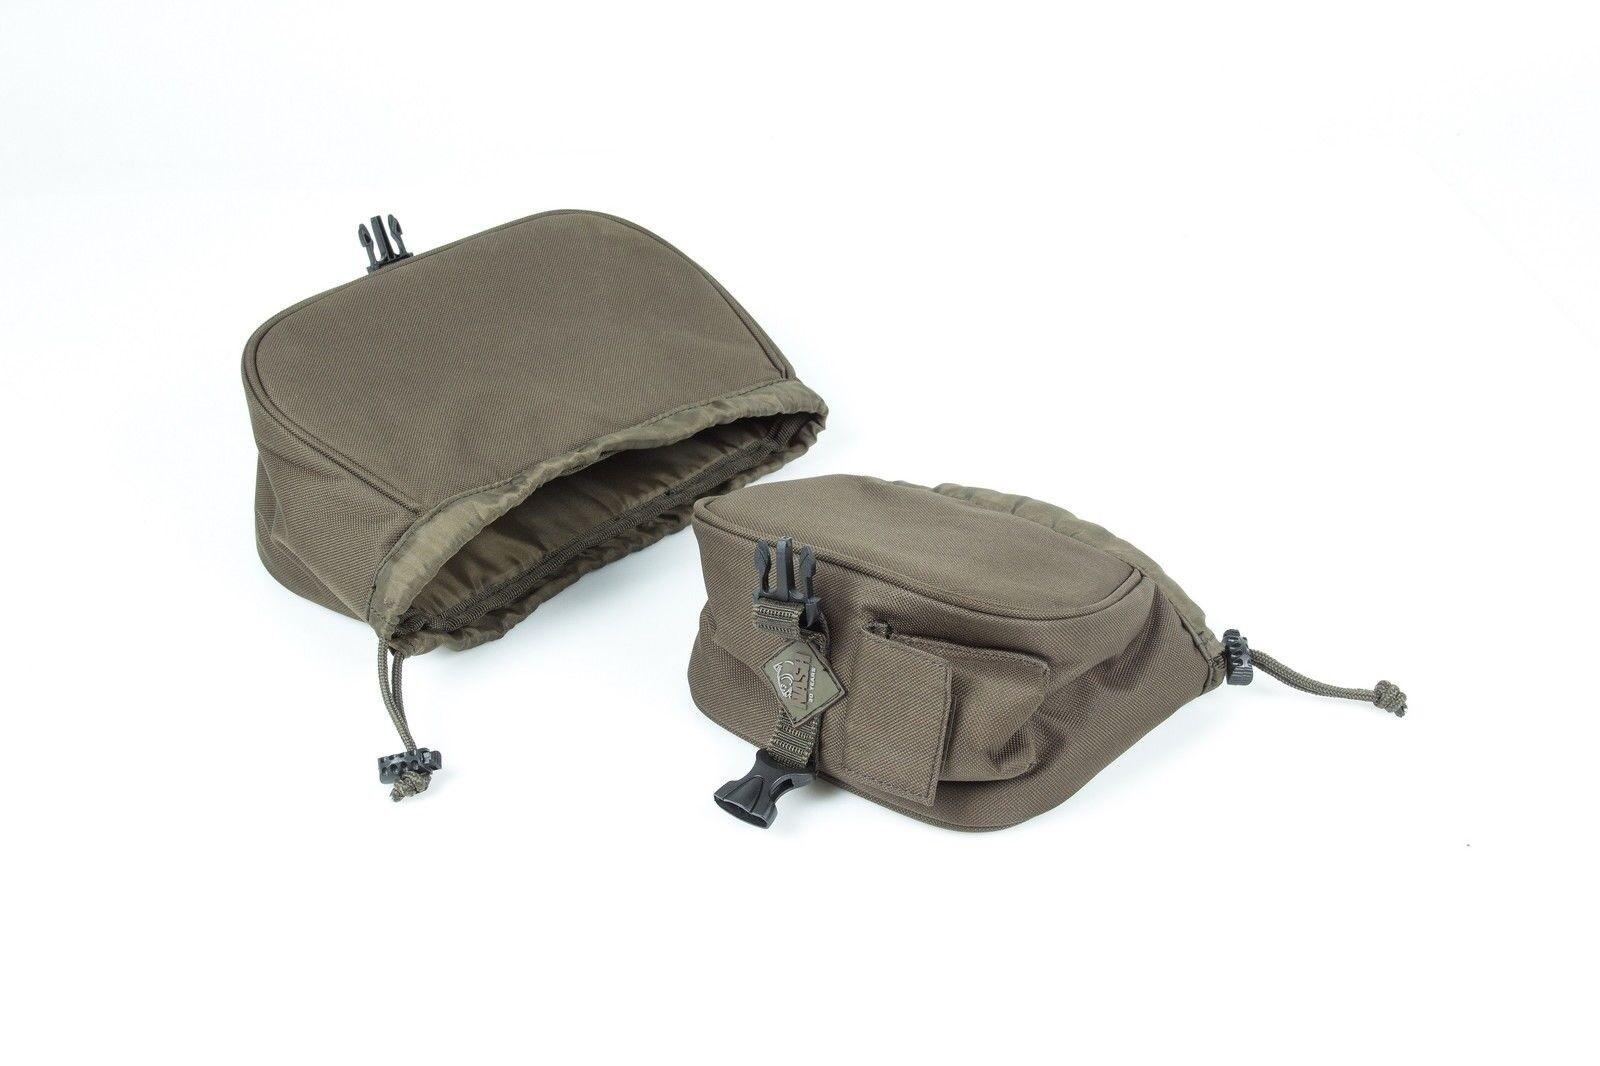 Anaconda Reel Carrier 7140033 Rollentasche Tasche Bag Case